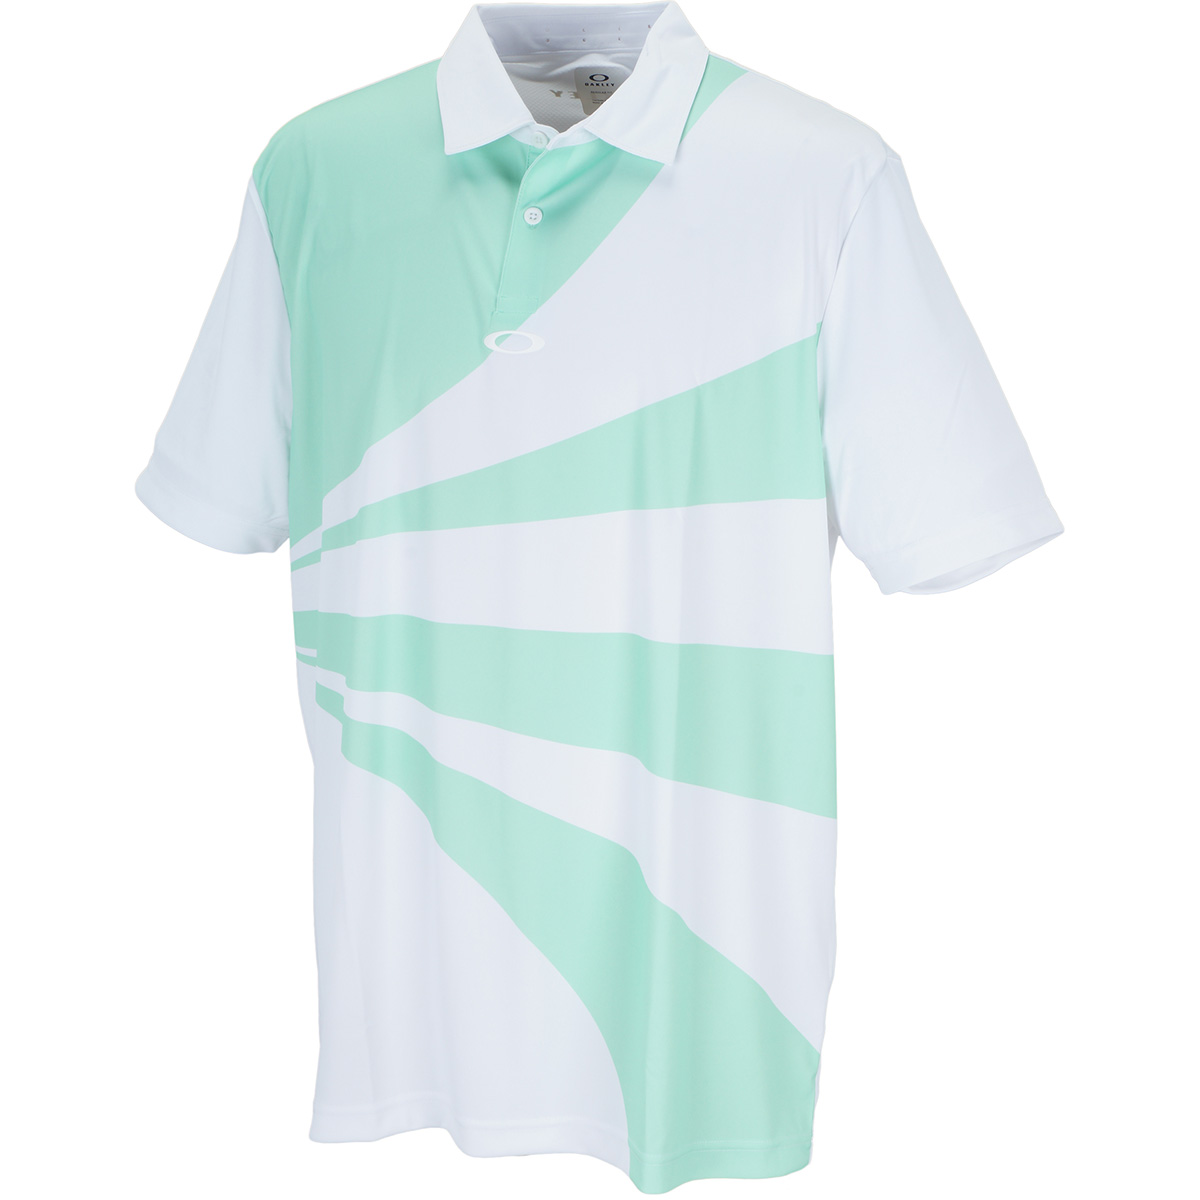 GEOMETRIC SWING 半袖ポロシャツ